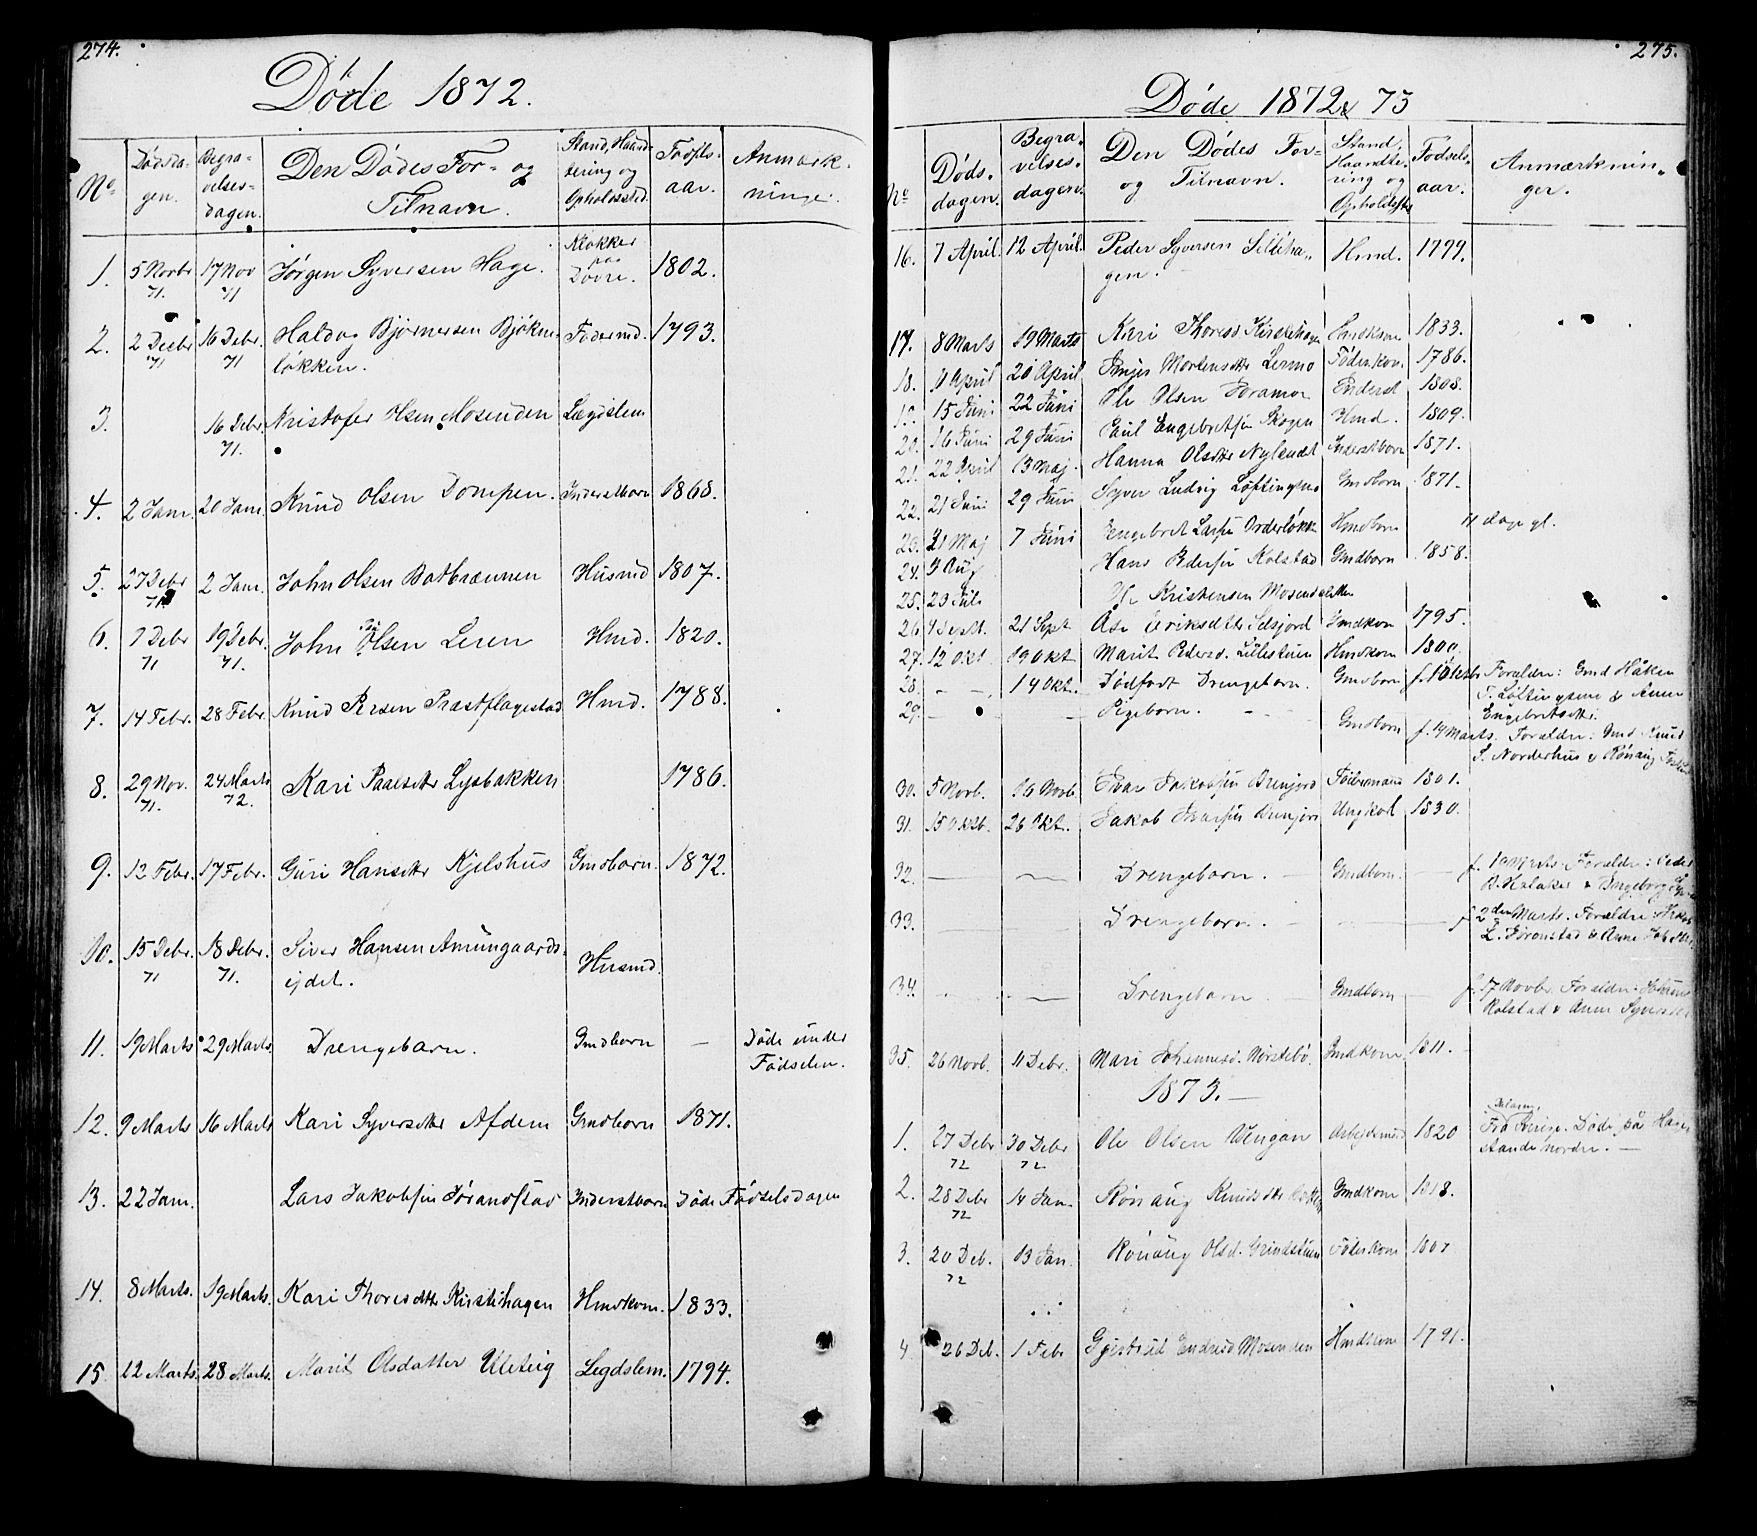 SAH, Lesja prestekontor, Klokkerbok nr. 5, 1850-1894, s. 274-275